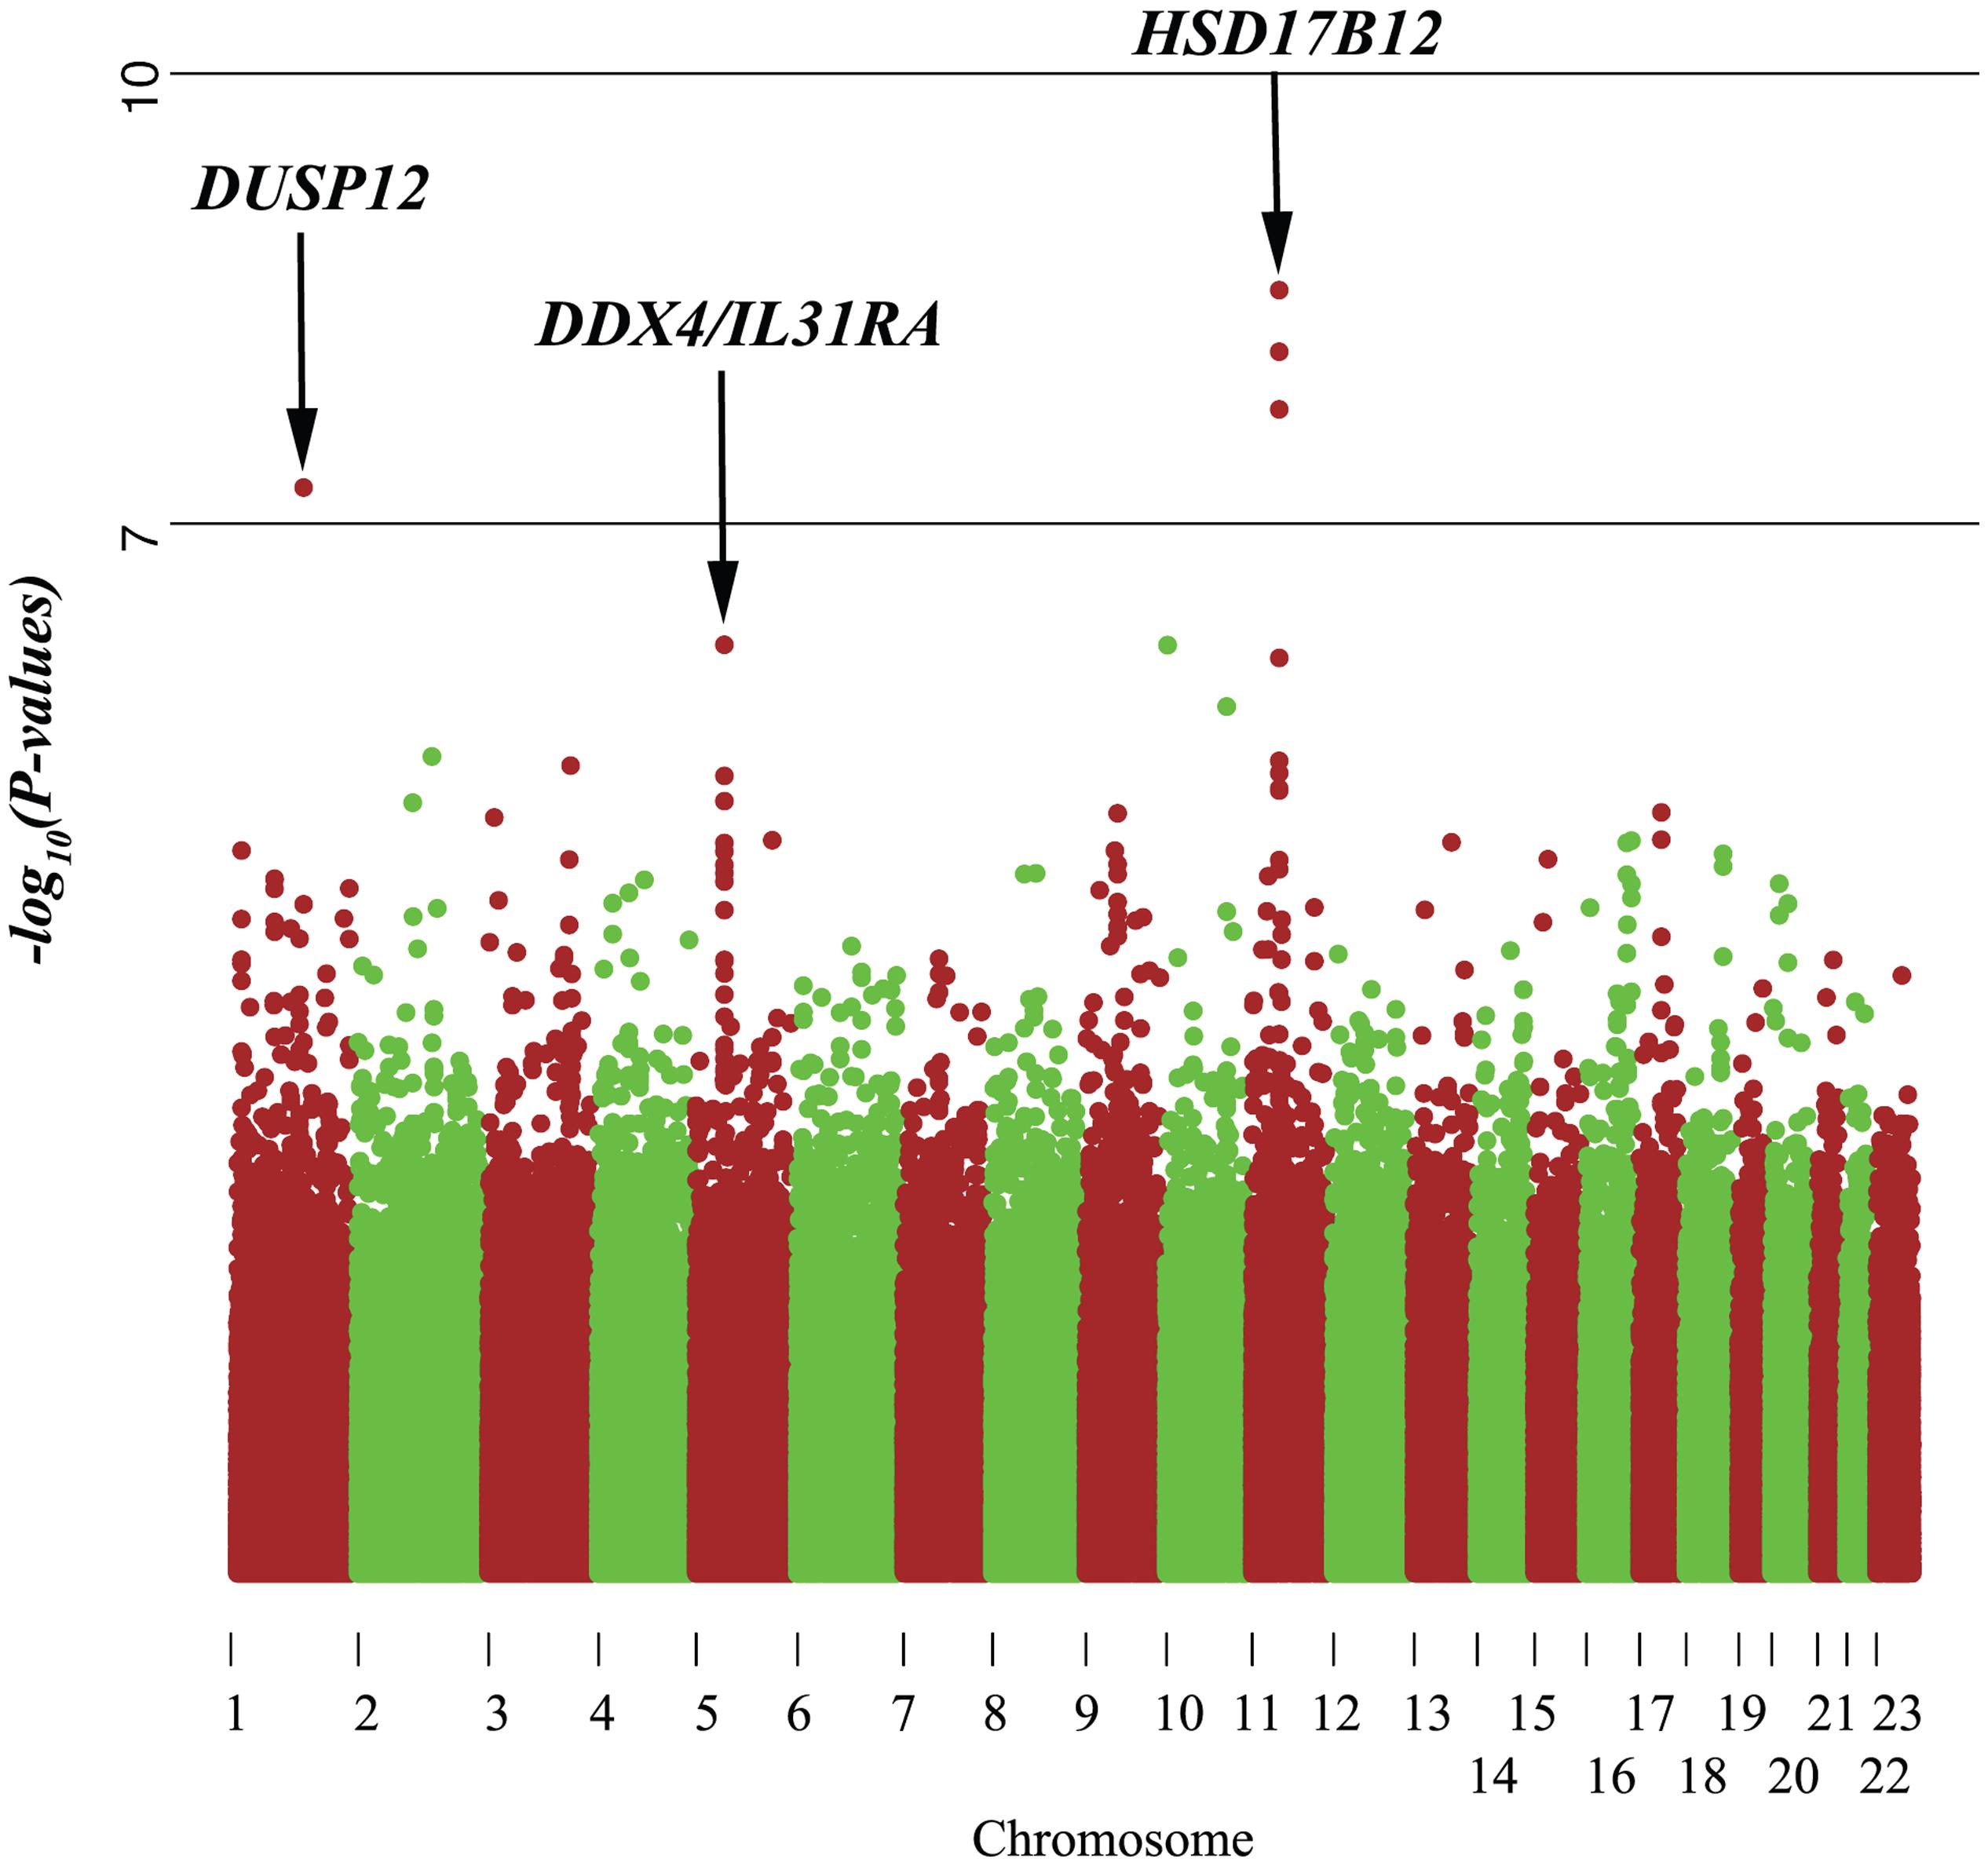 Manhattan plot of single marker analysis of the low-risk neuroblastoma data set.